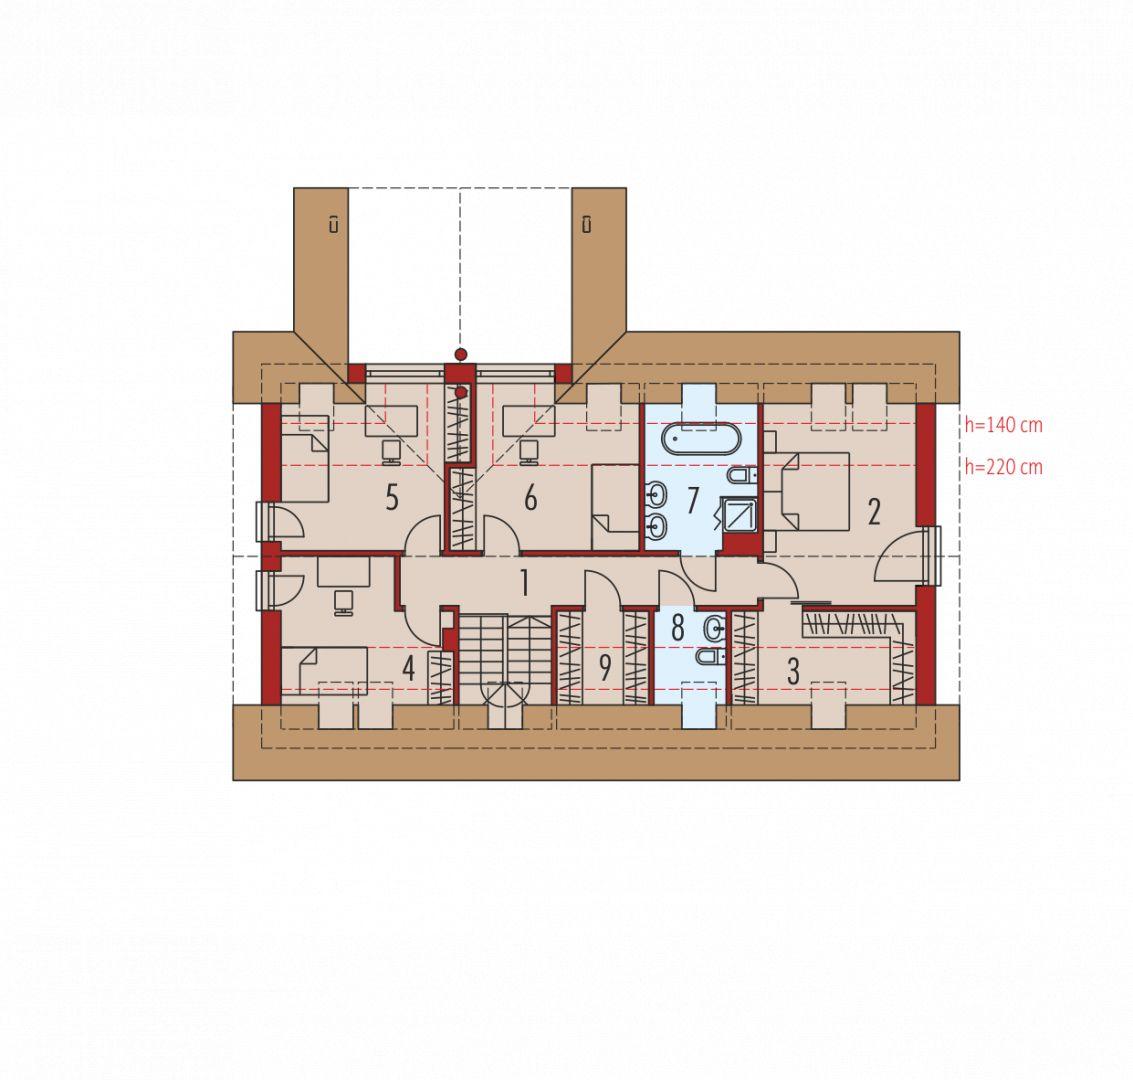 1. Korytarz 9.30 m² 2. Sypialnia 12.64 m² 3. Garderoba 5.37 m² 4. Sypialnia 8.17 m² 5. Sypialnia 10.93 m² 6. Sypialnia 10.95 m² 7. Łazienka 5.83 m² 8. Łazienka 2.08 m² 9. Garderoba 2.66 m²